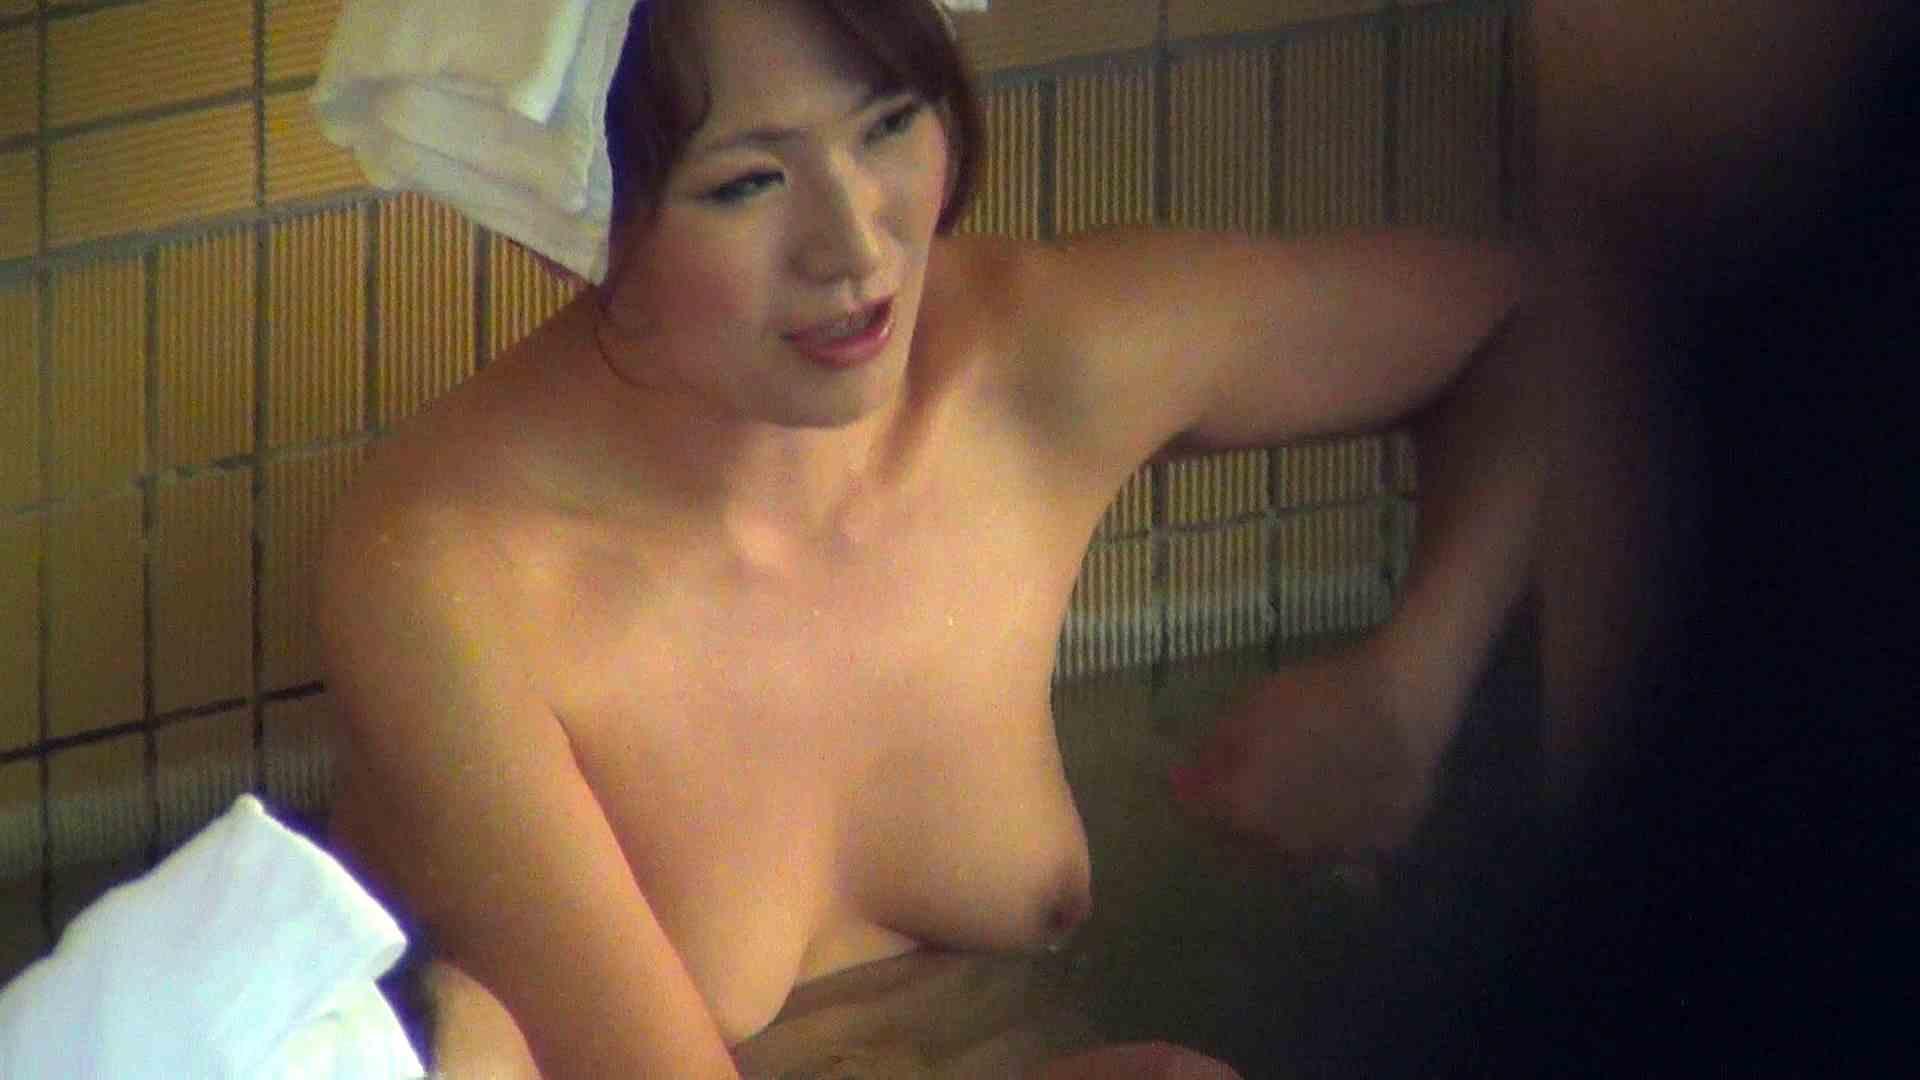 Aquaな露天風呂Vol.272 盗撮シリーズ | 露天風呂編  106PIX 85